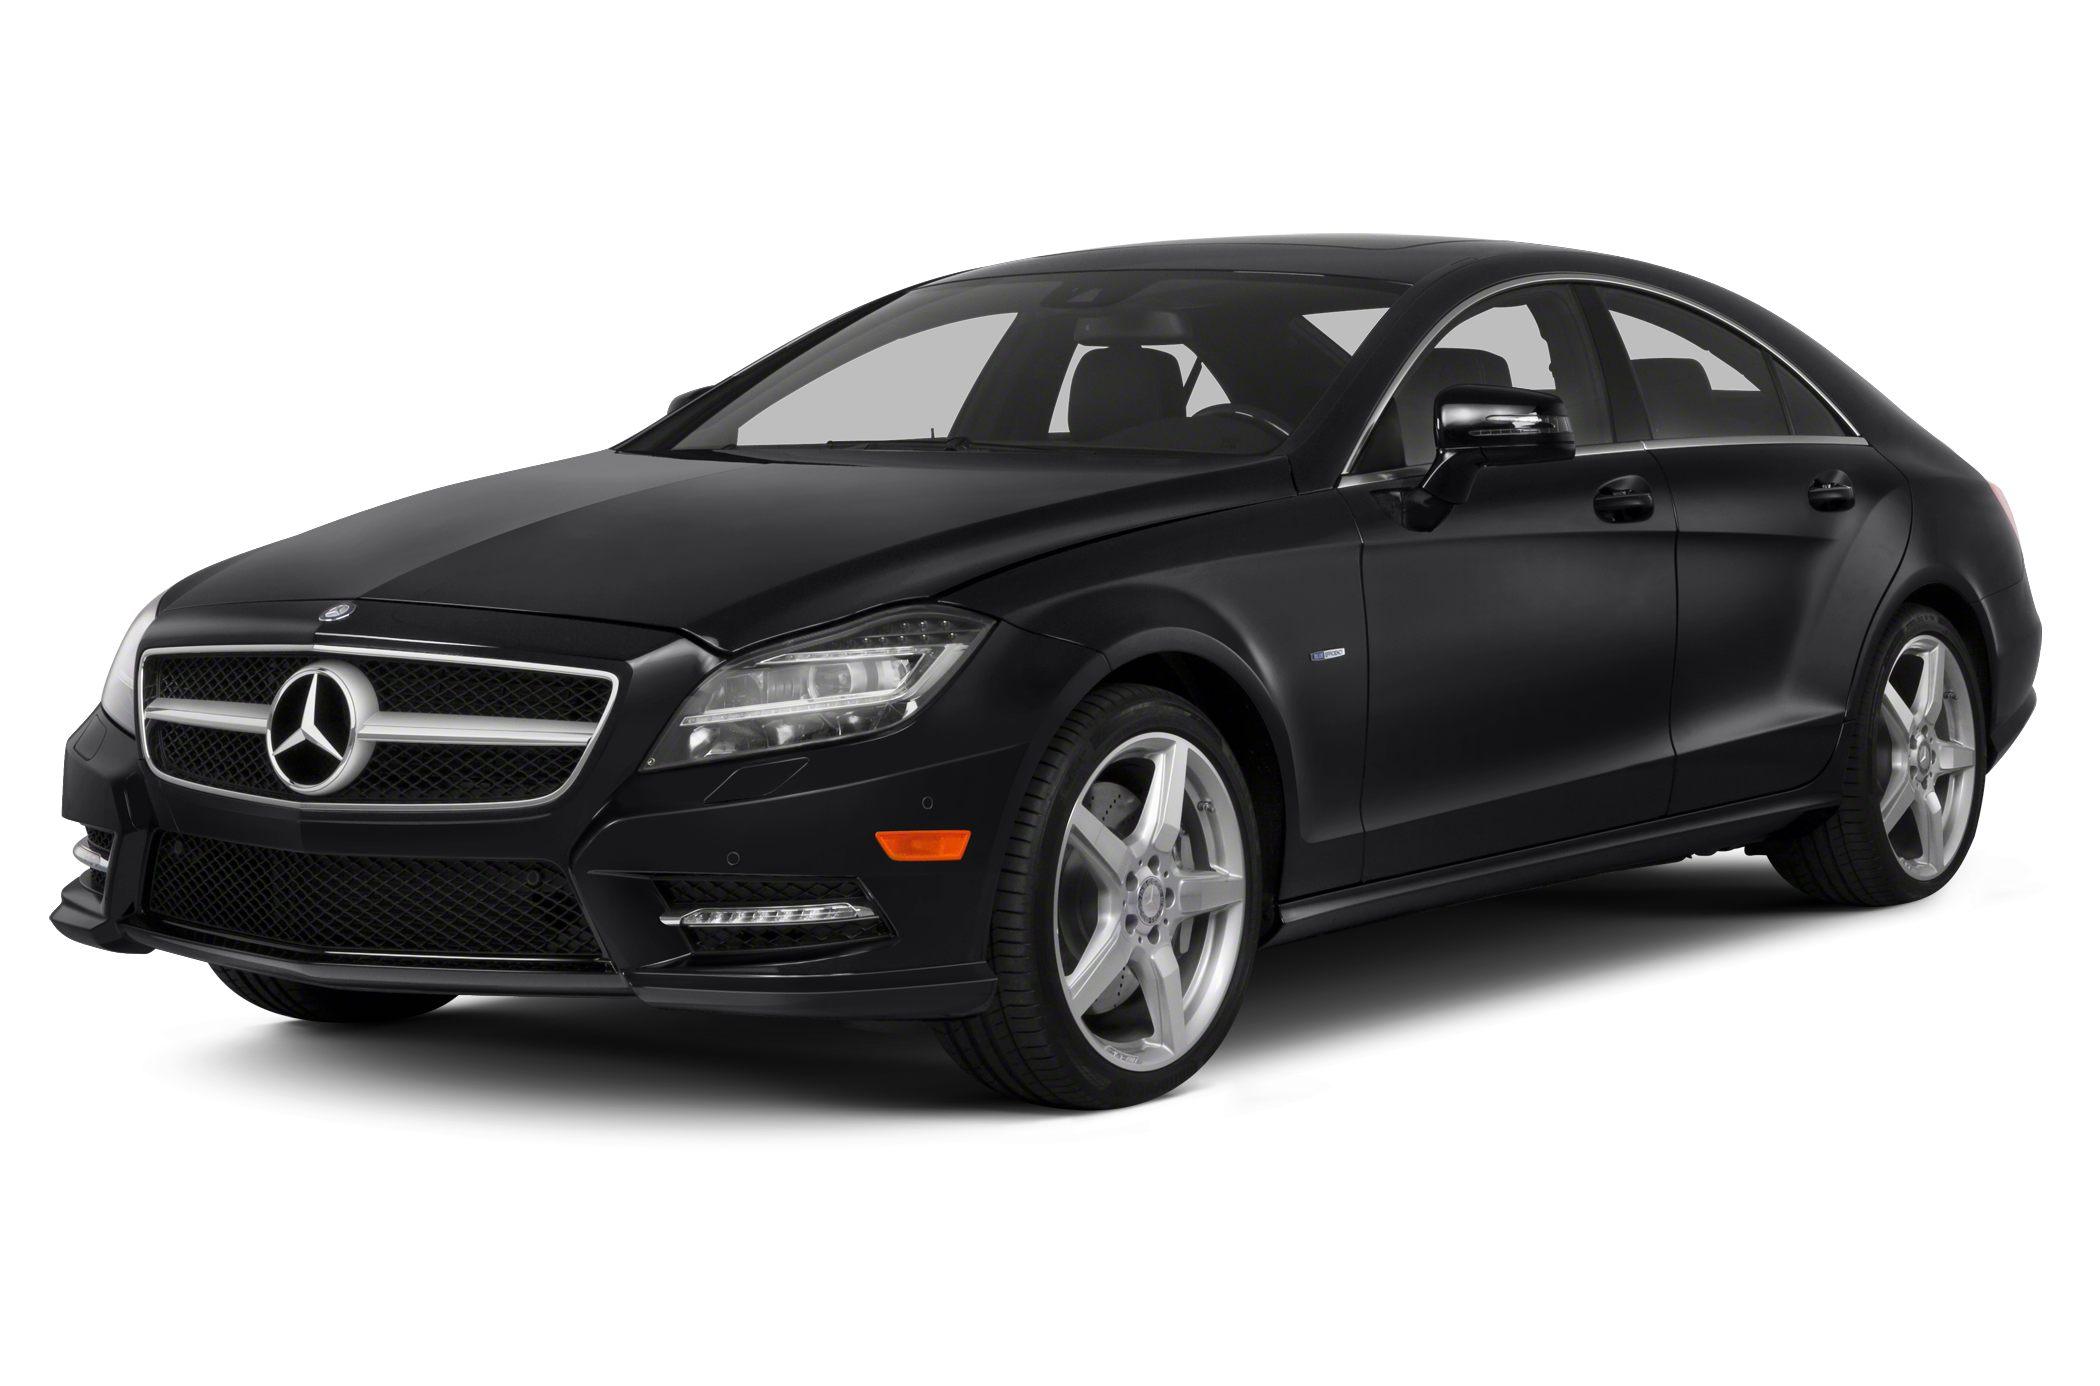 2012 Mercedes Benz CLS Class Safety Features